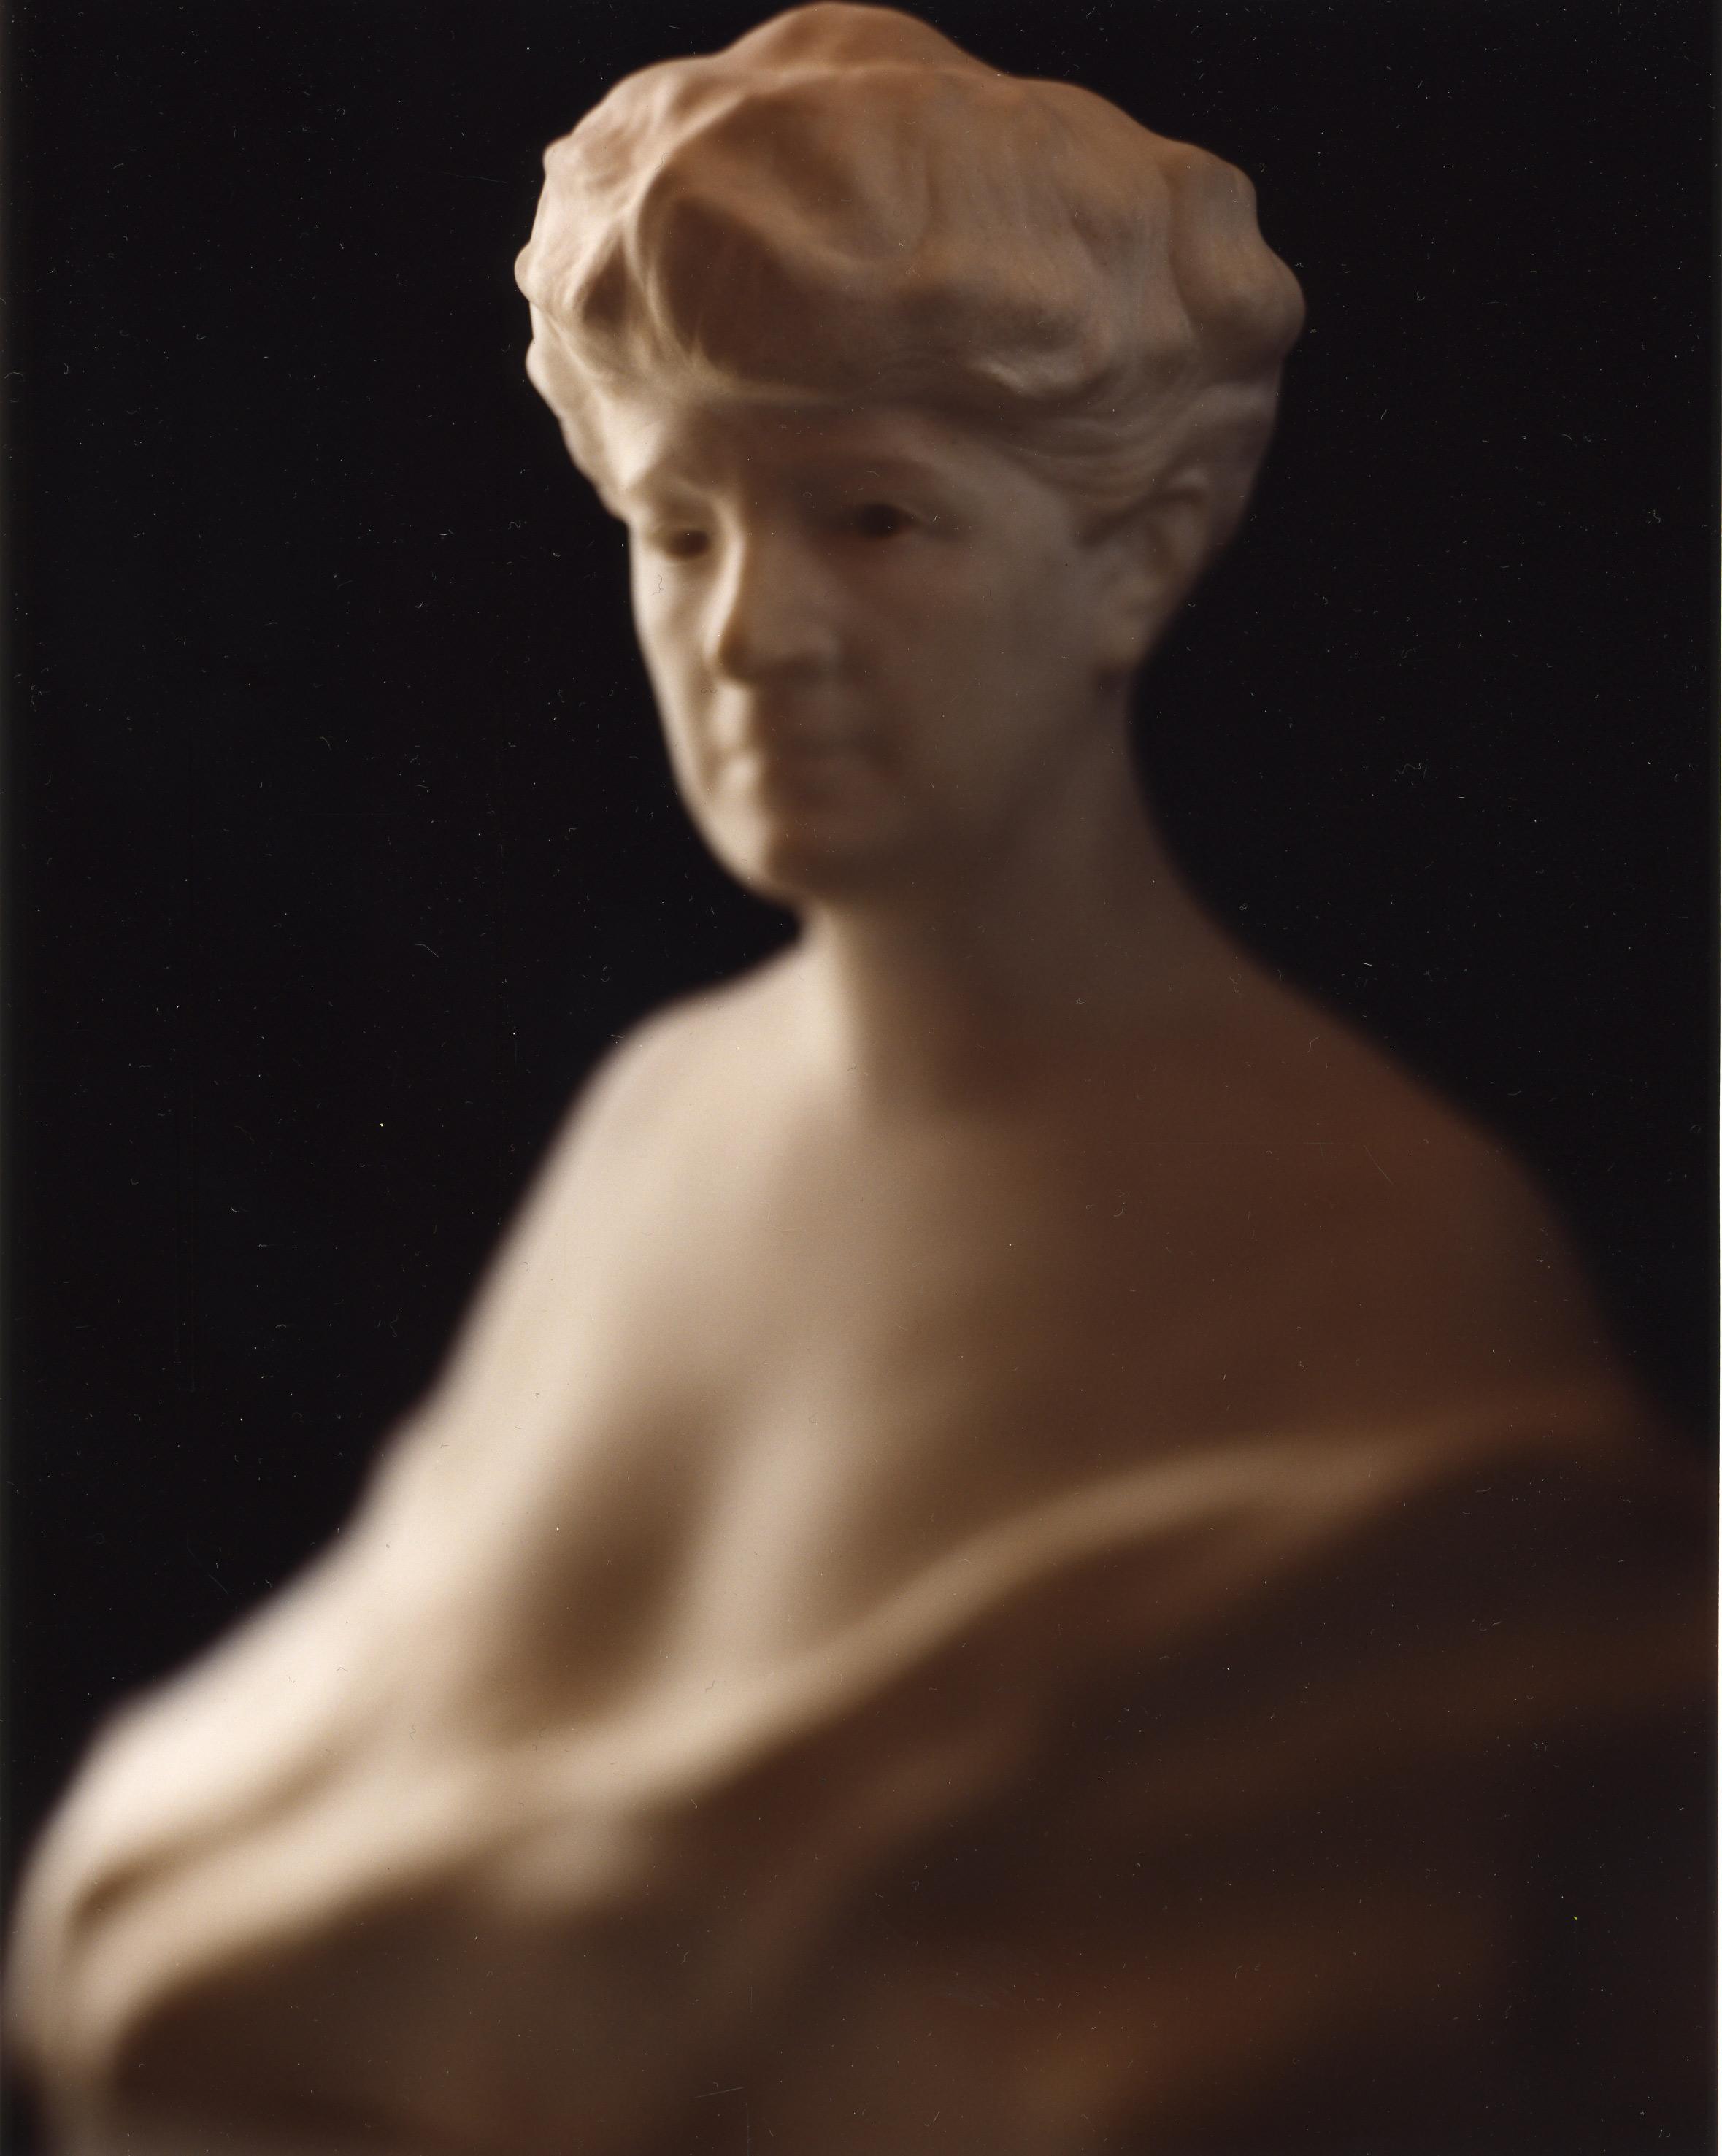 """Bertha Palmer Musee Rodin,"" 2009, photograph, 20x24 in."